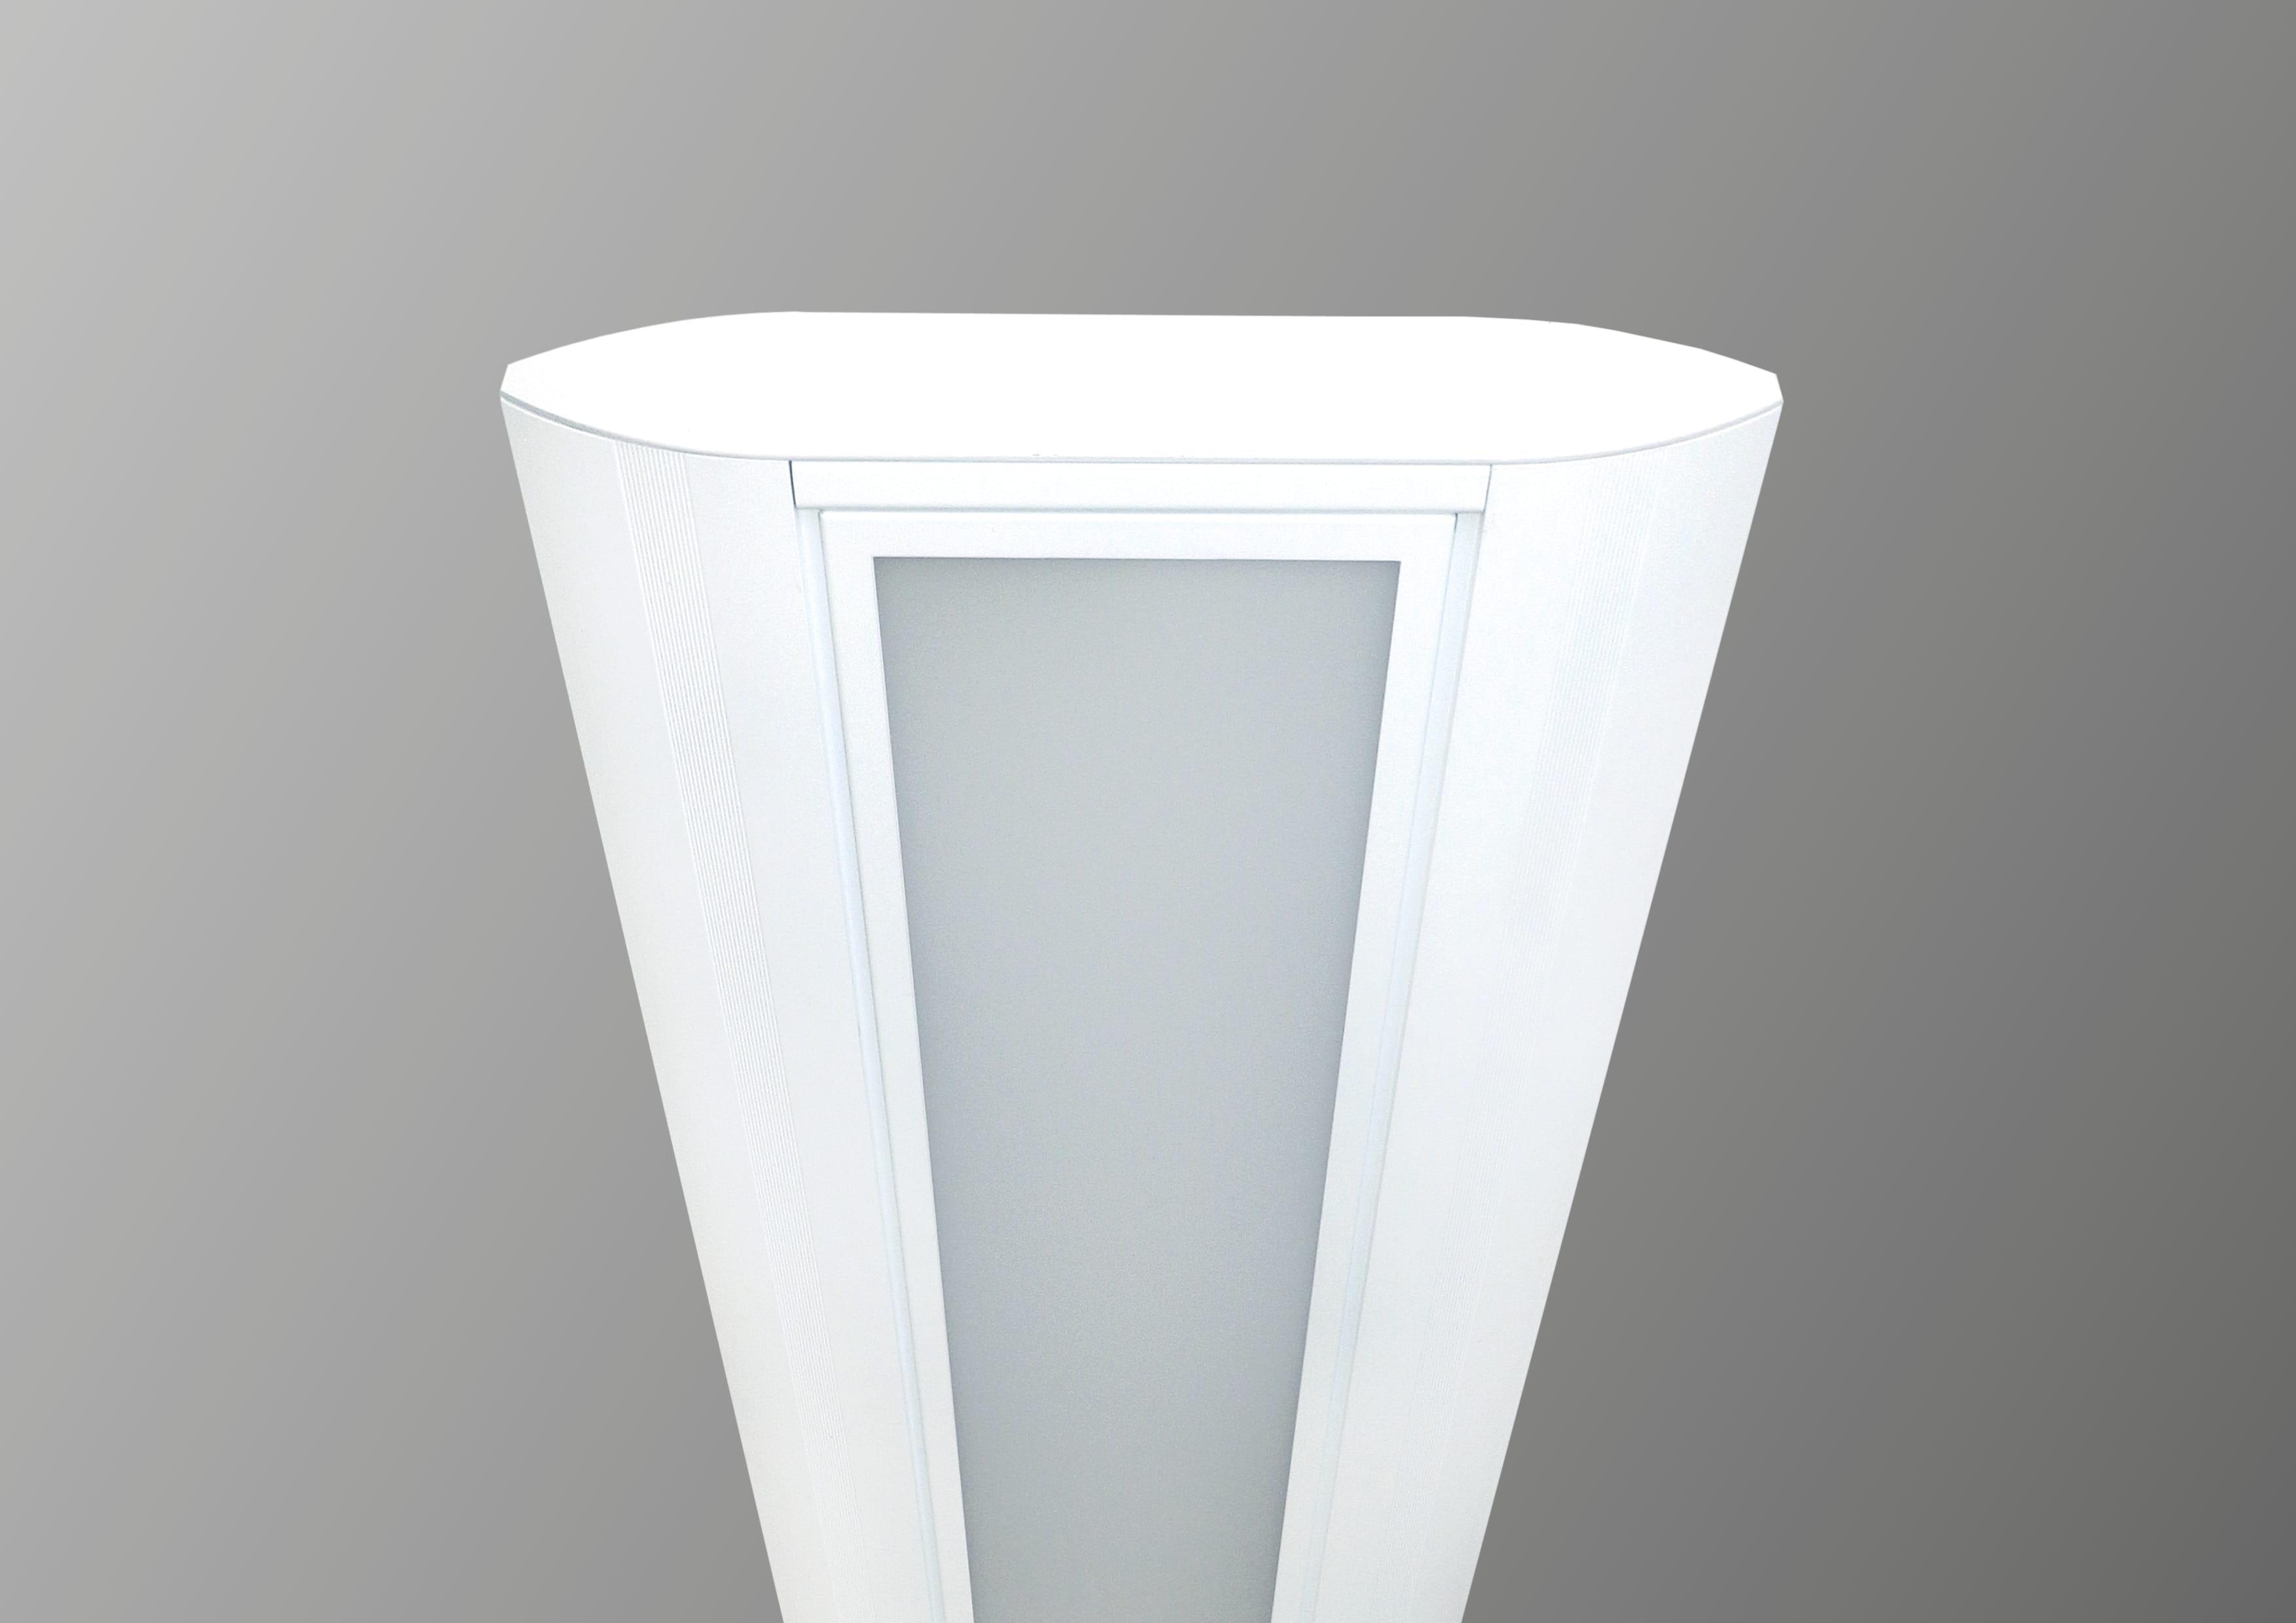 https://contrac-lighting.co.uk/wp-content/uploads/2018/01/TORRA-END-VIEW-1.jpg